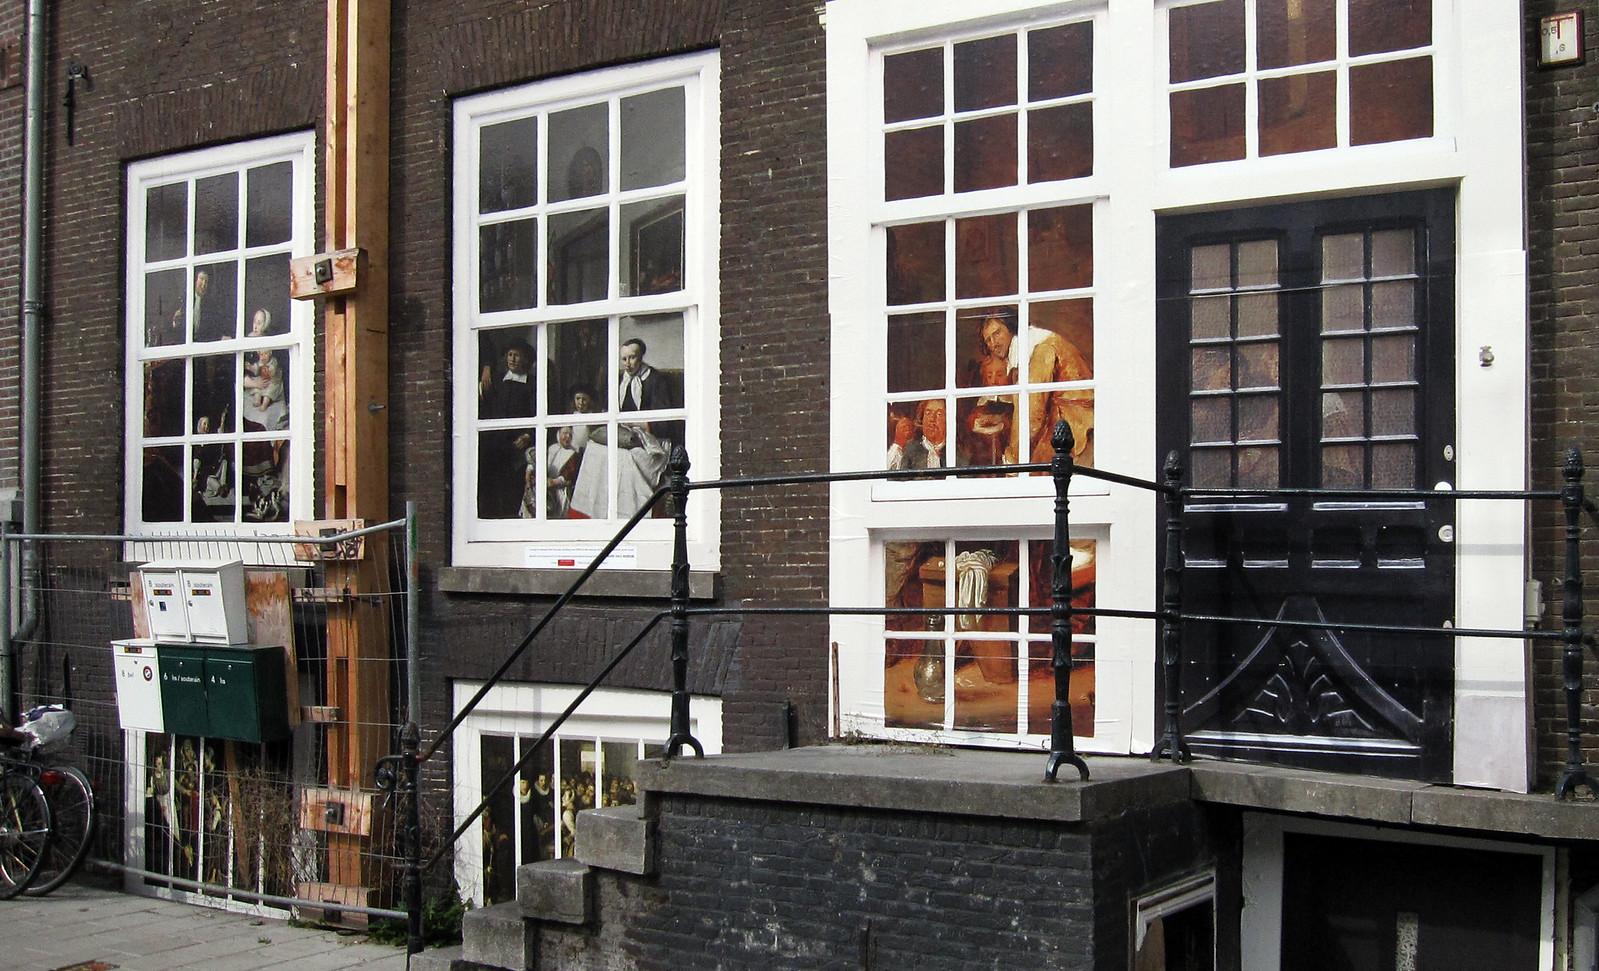 Amsterdam 584